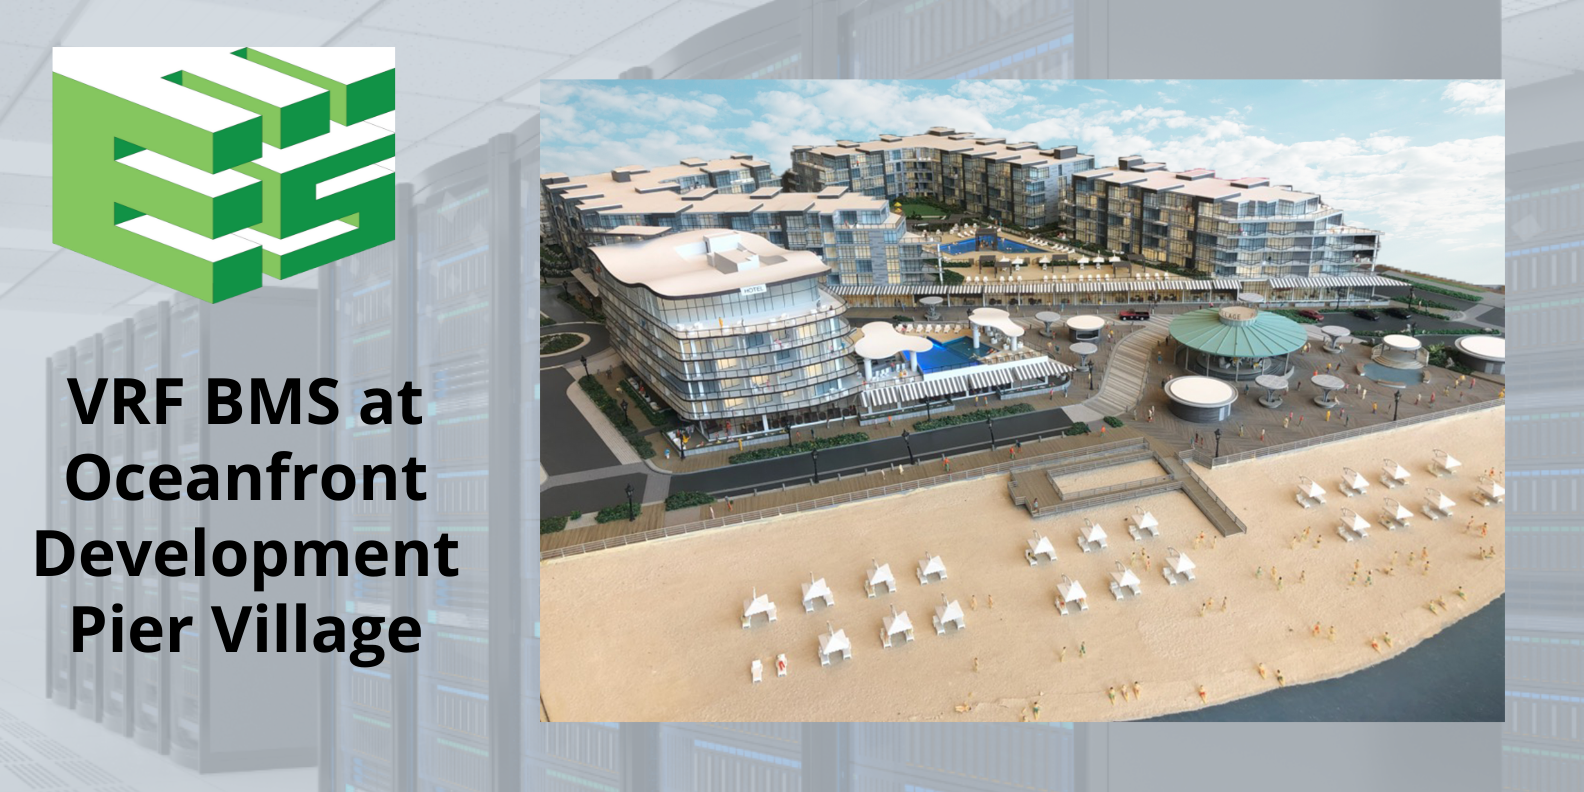 EES release Pier Village